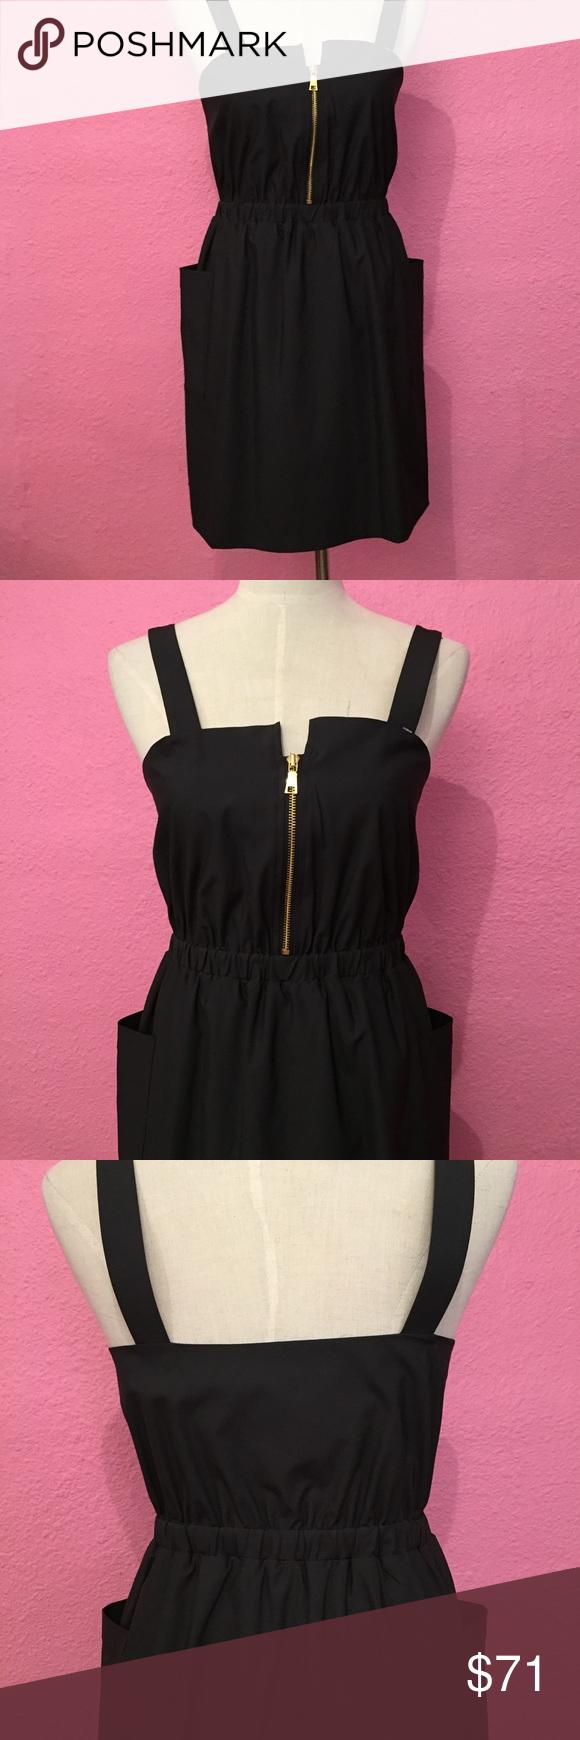 Fun little dress. Fun little dress. Andrew Marc Dresses | My Posh ...